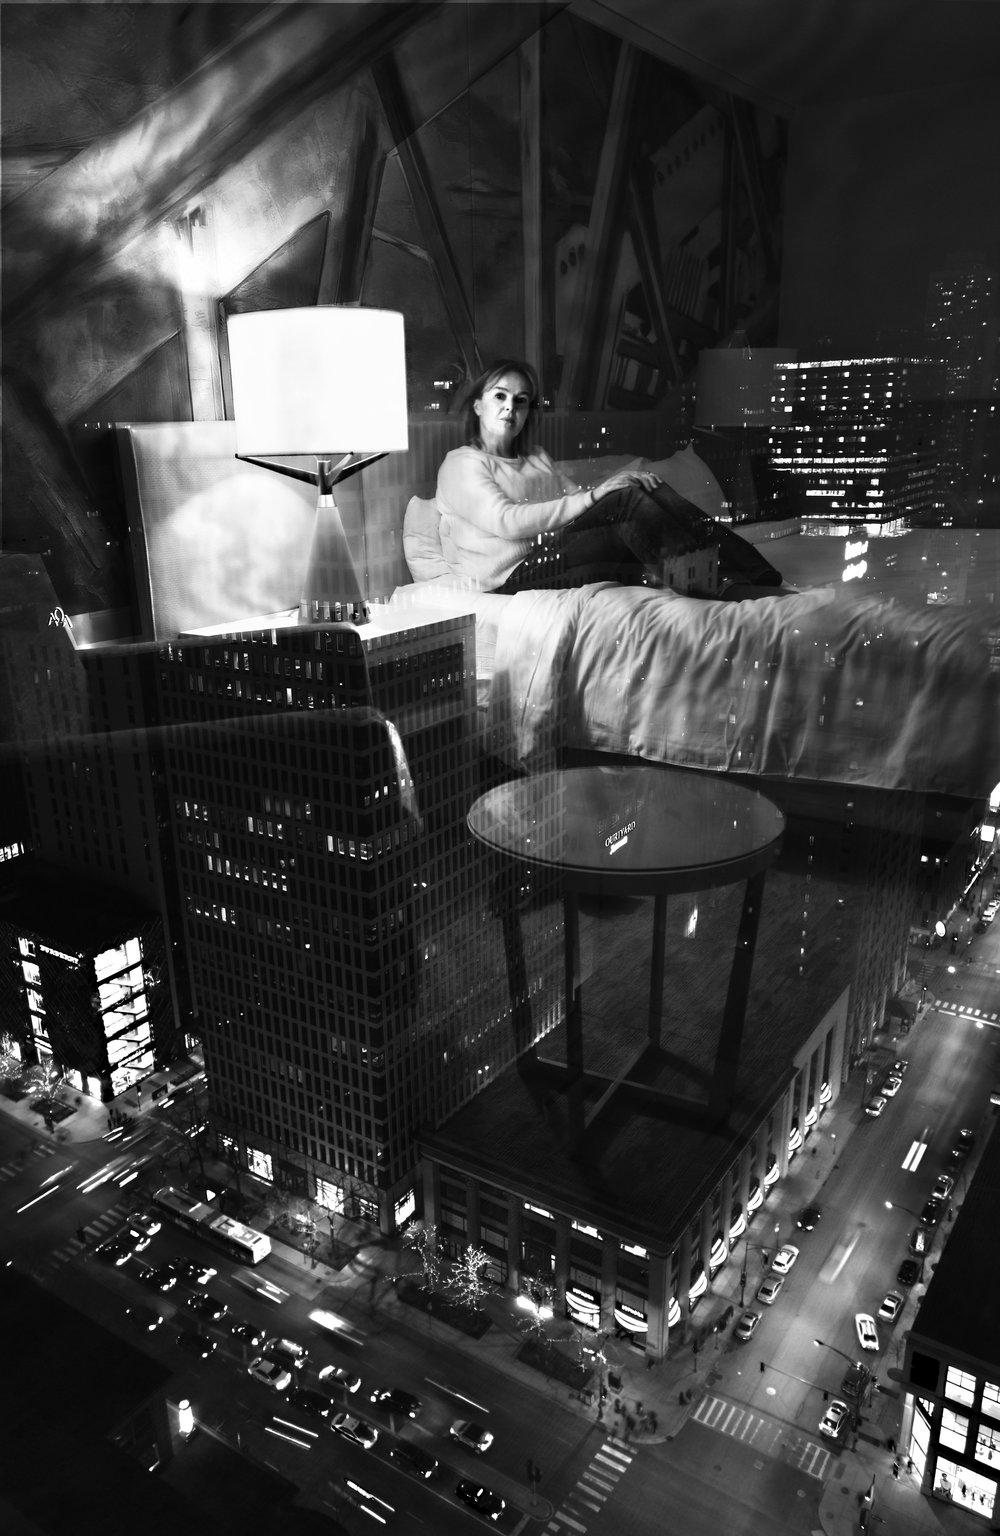 Alison Swinburne, Lonely in Chicago